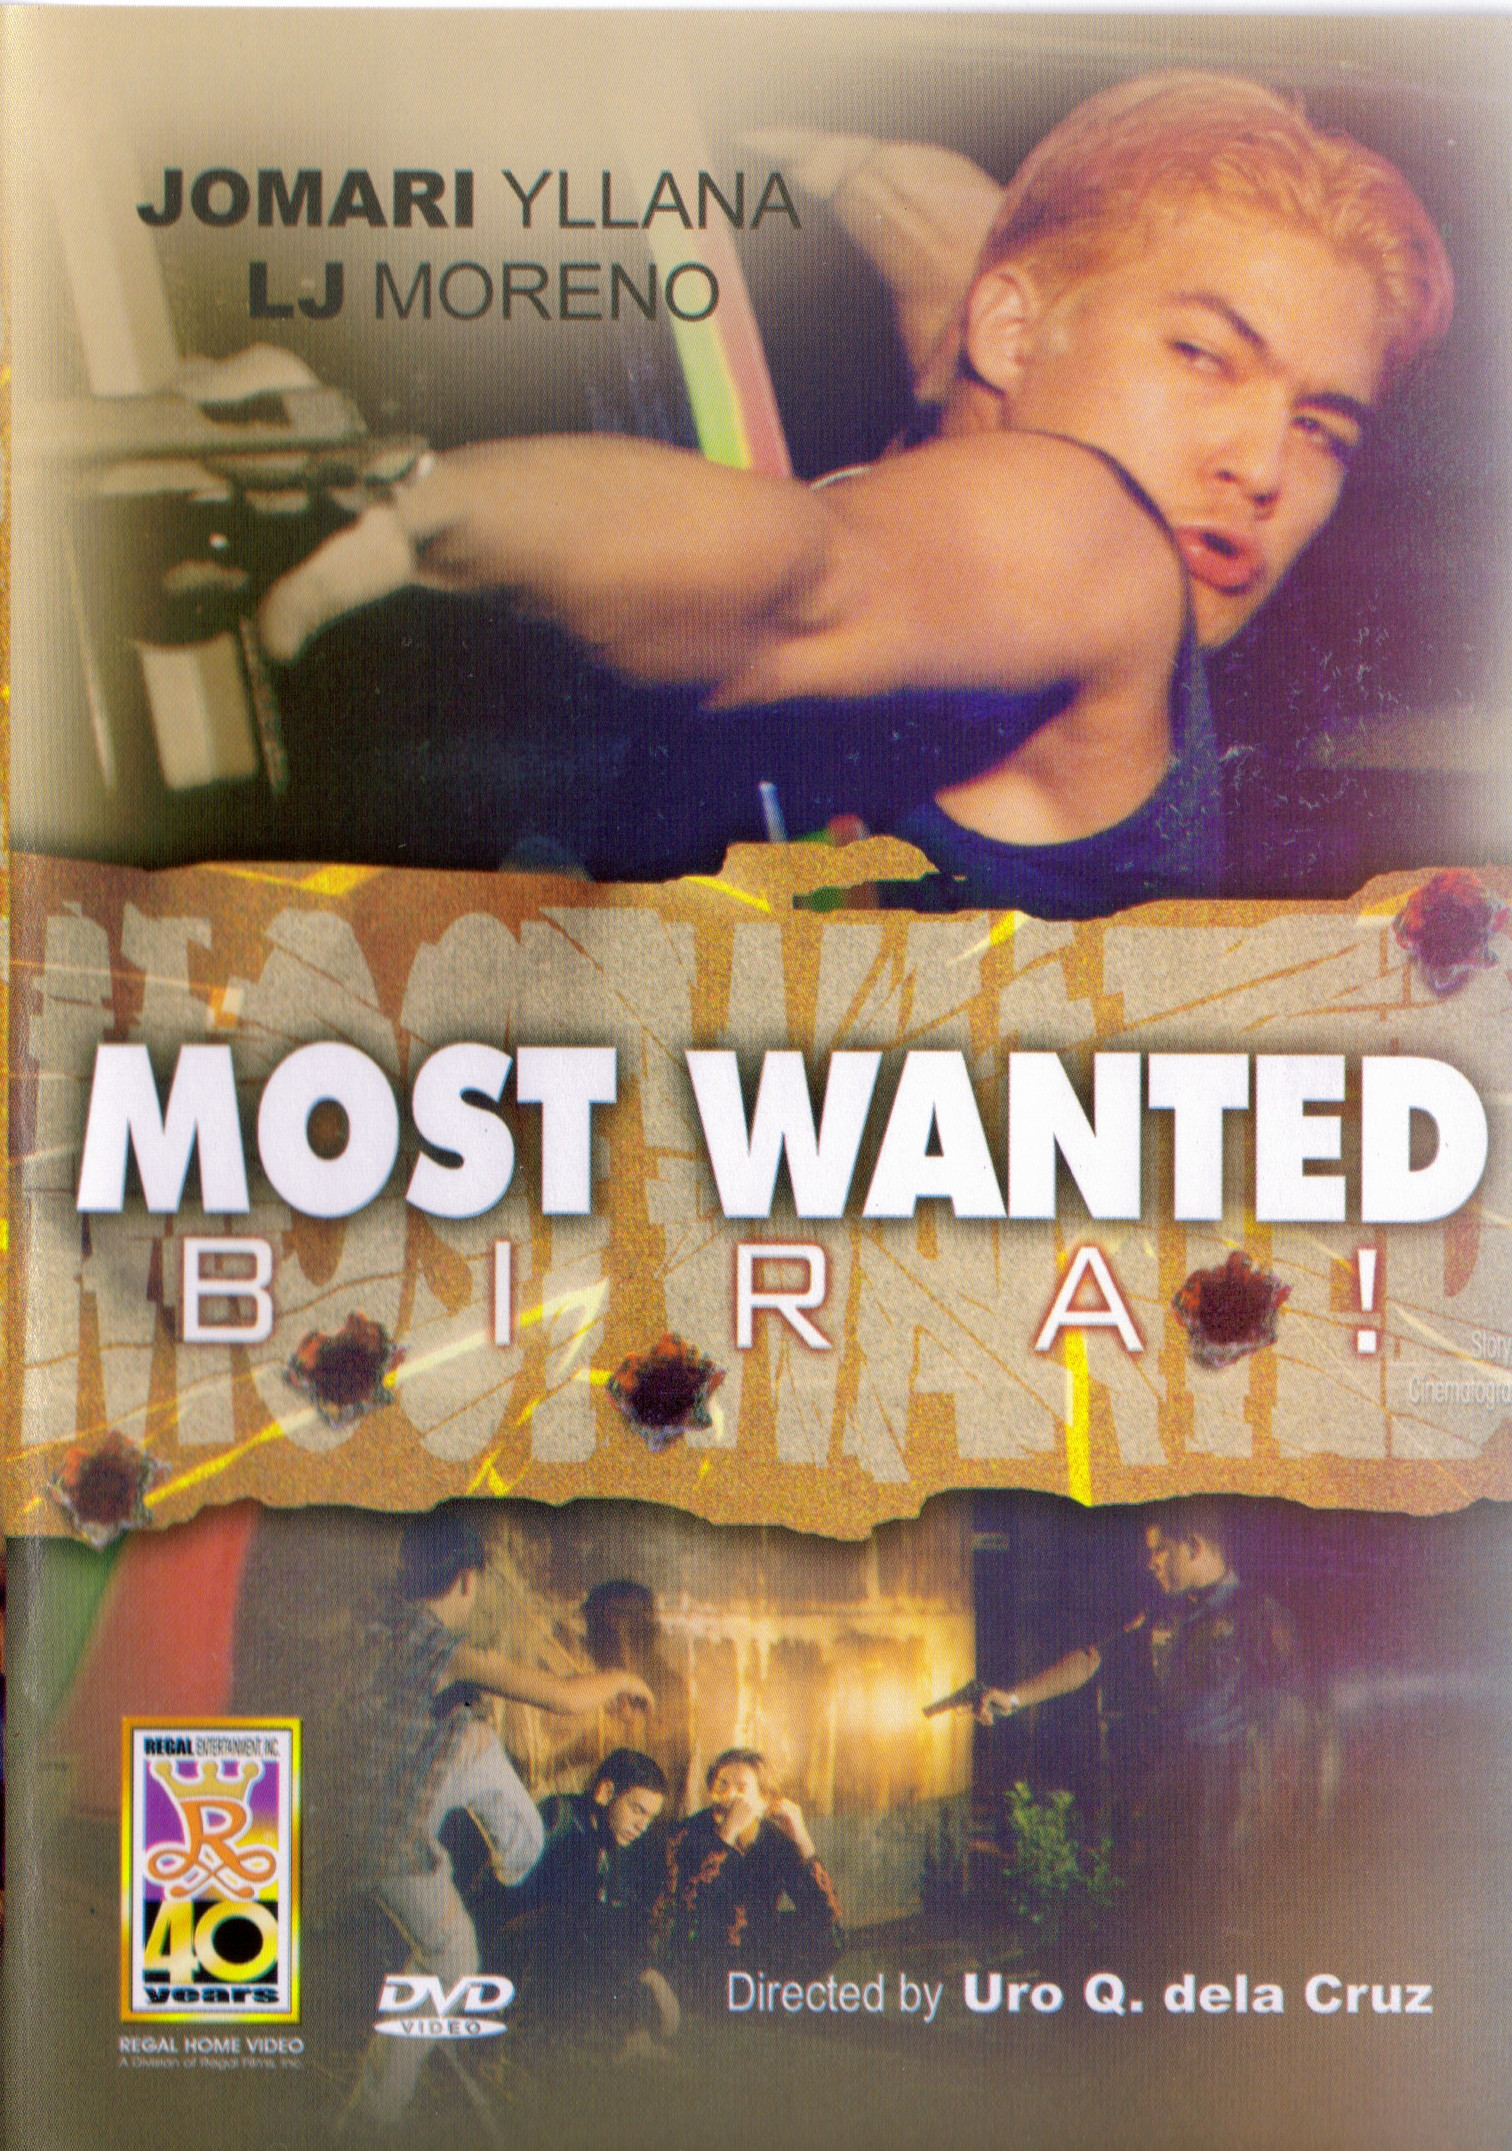 Most Wanted Bira!